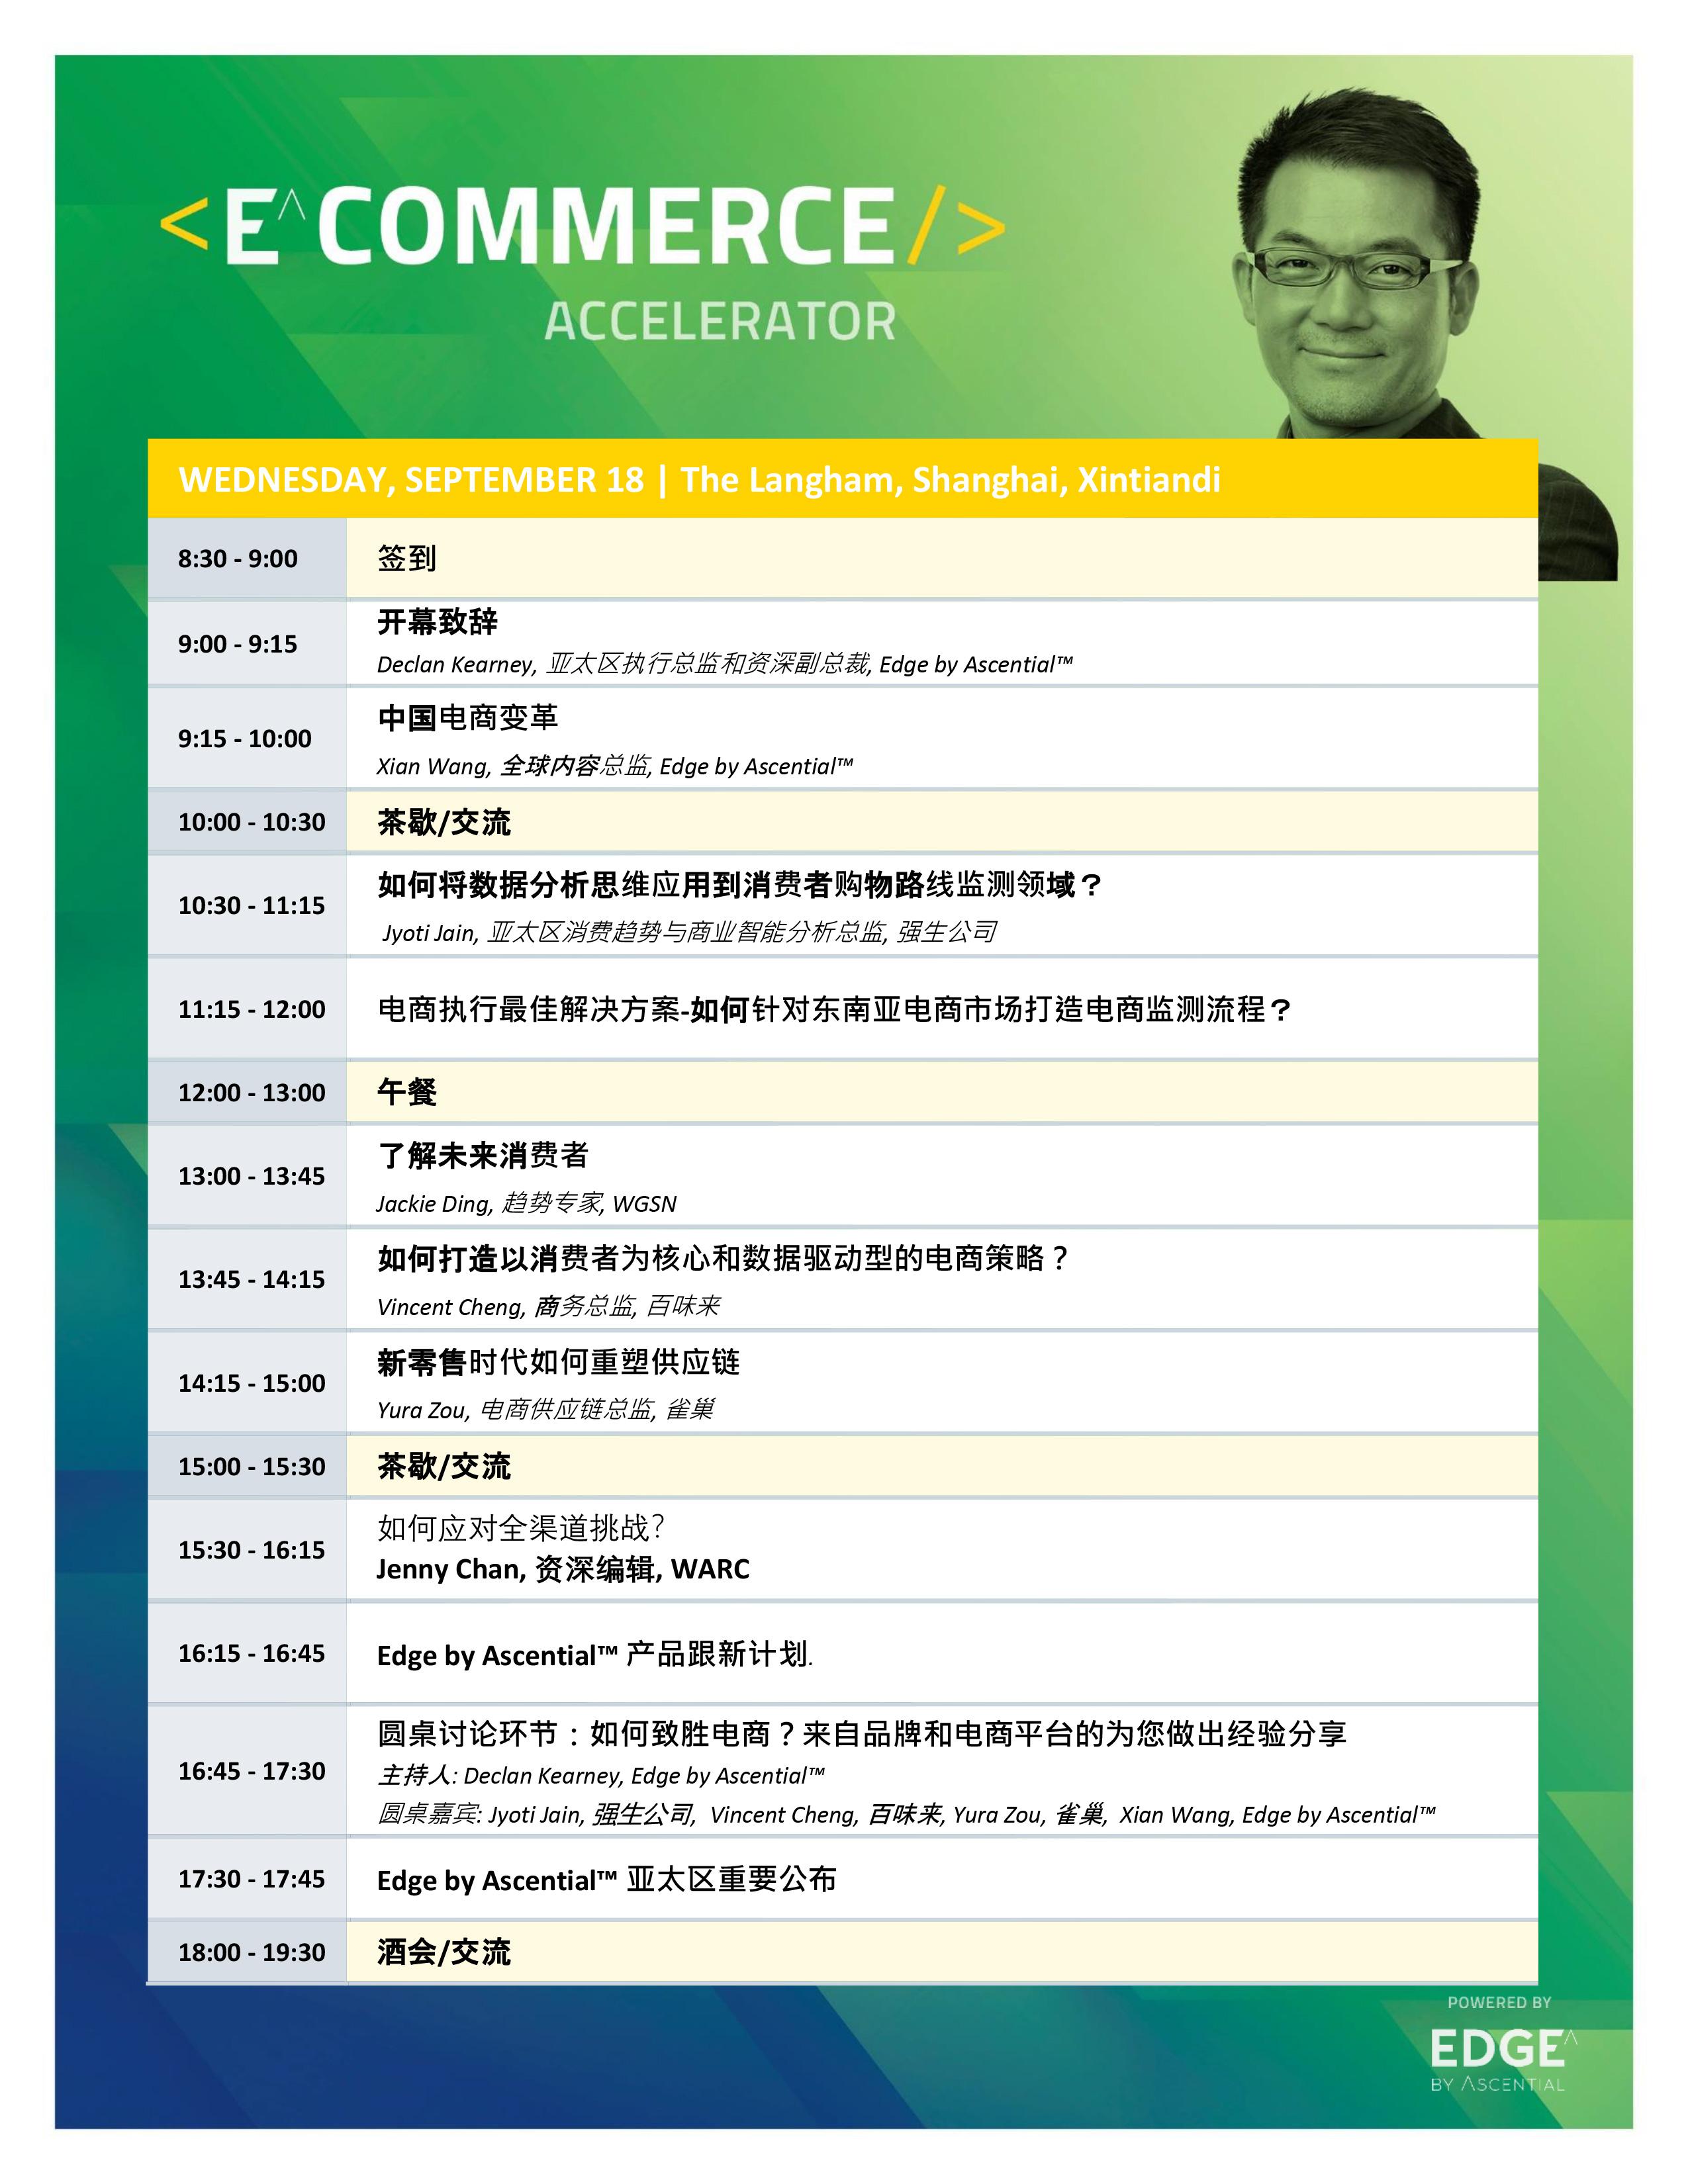 Edge by Ascential 2019第三届亚太电商加速峰会(上海)